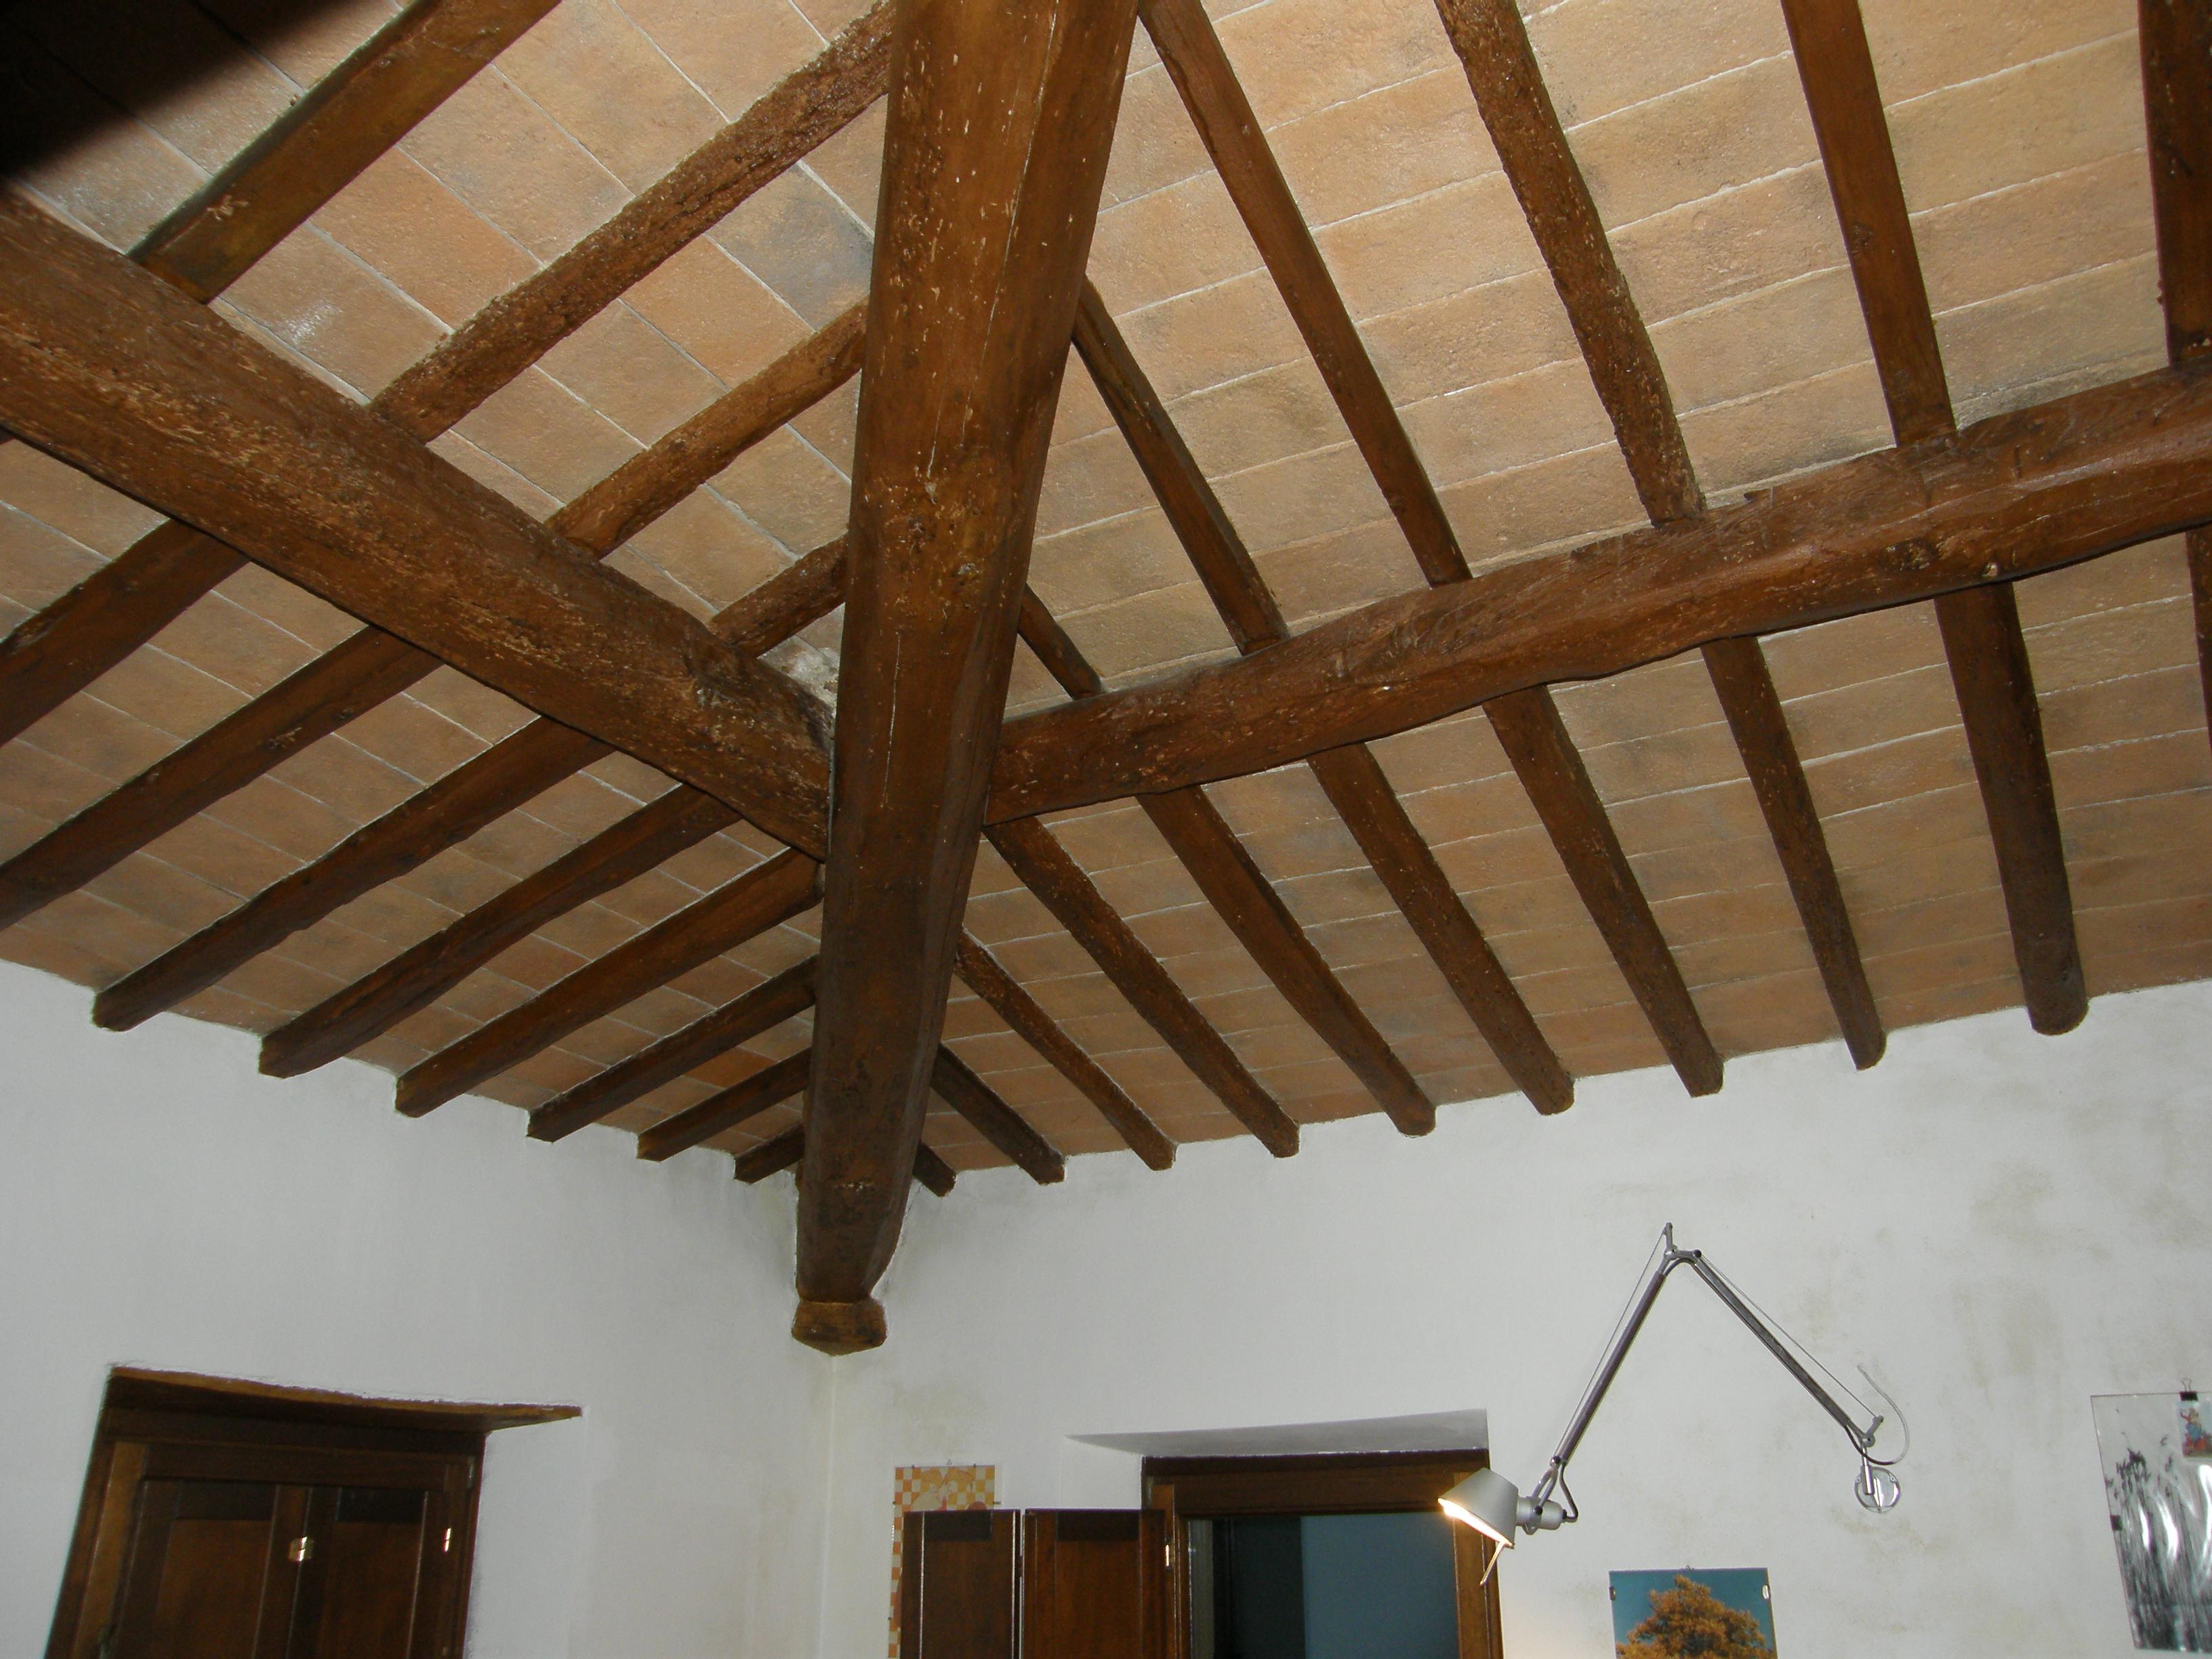 file italien toskana innenansicht eines alten wikimedia commons. Black Bedroom Furniture Sets. Home Design Ideas